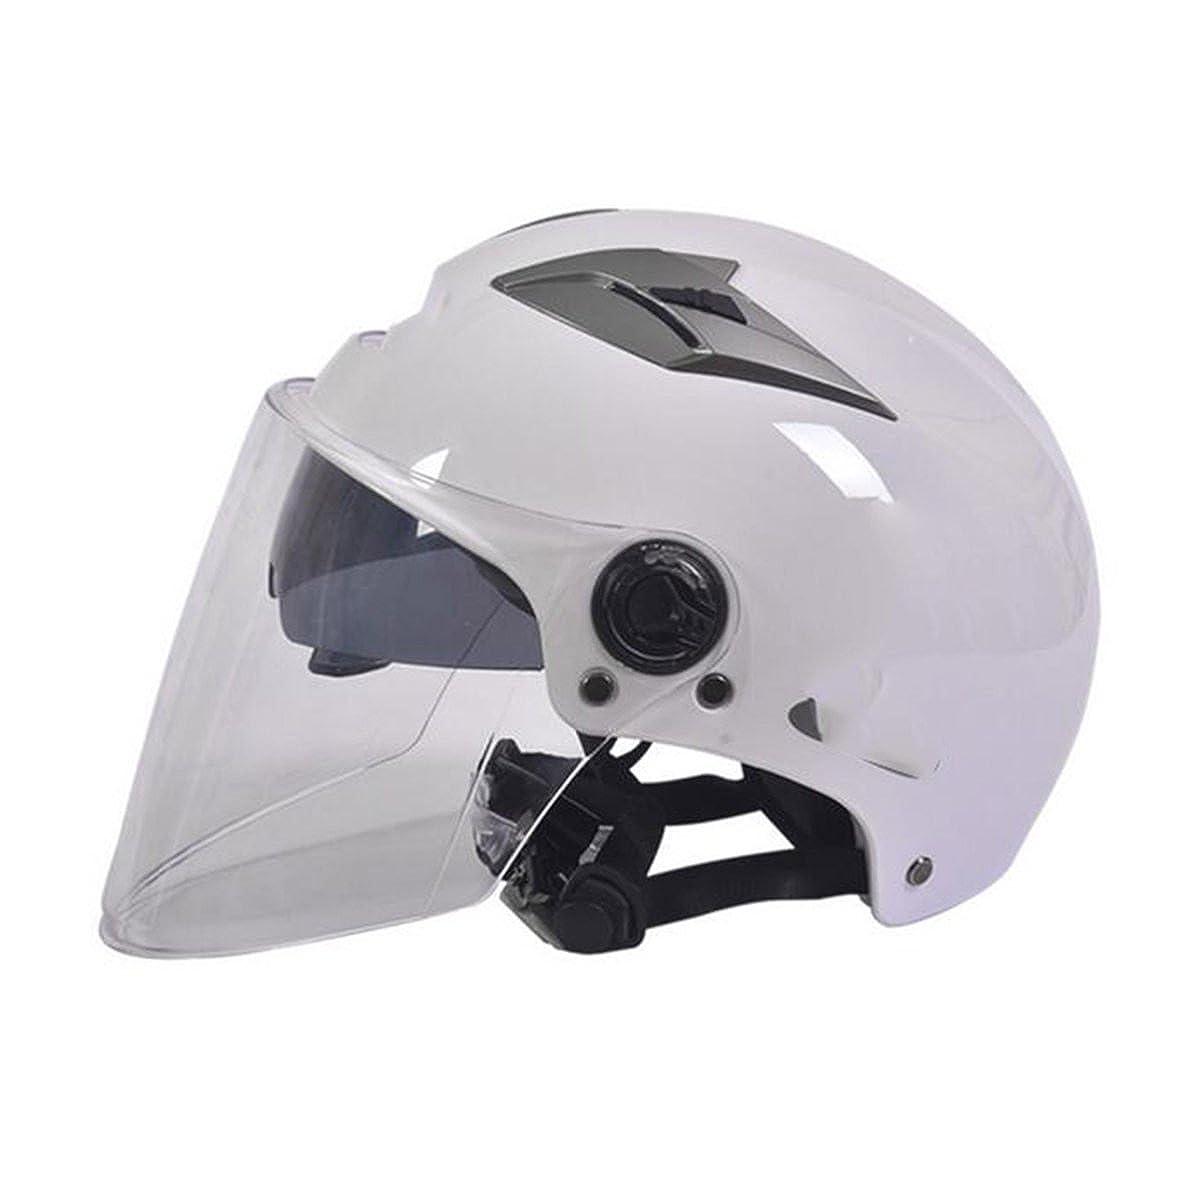 TZQ Double Lens Half-coveROT Damen Half Helm Männer Mode Wrestling Hut Motorrad Batterie Auto Helm